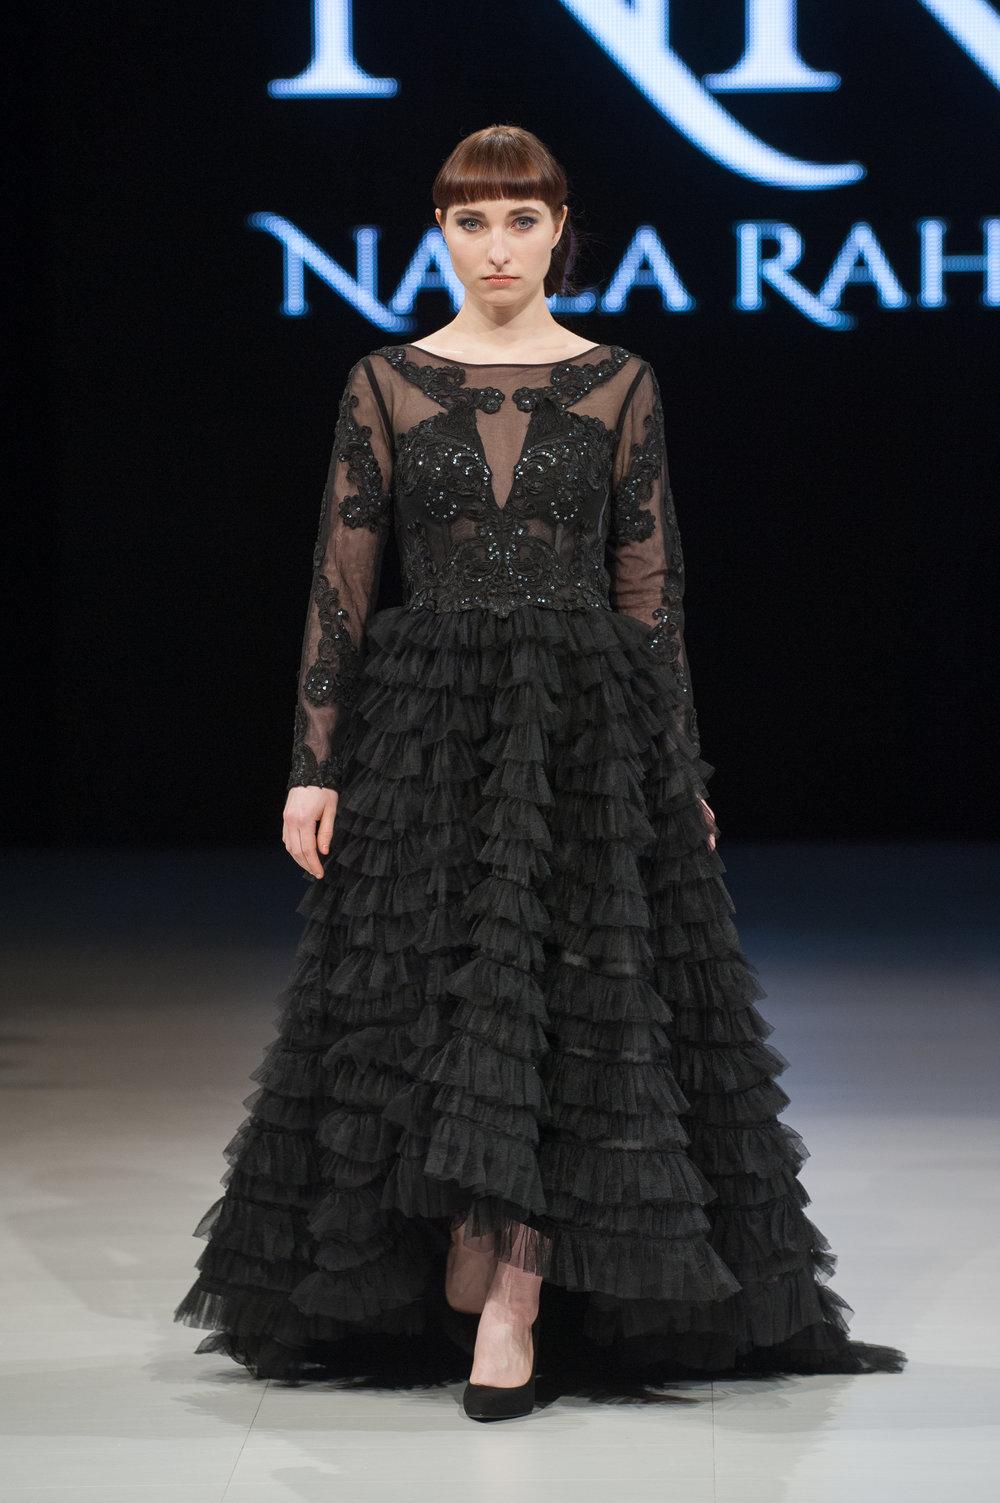 FAT2018-Day1-April17-Najla_Rahimi-Runway-Che_Rosales-LARAWAN-5981.jpg